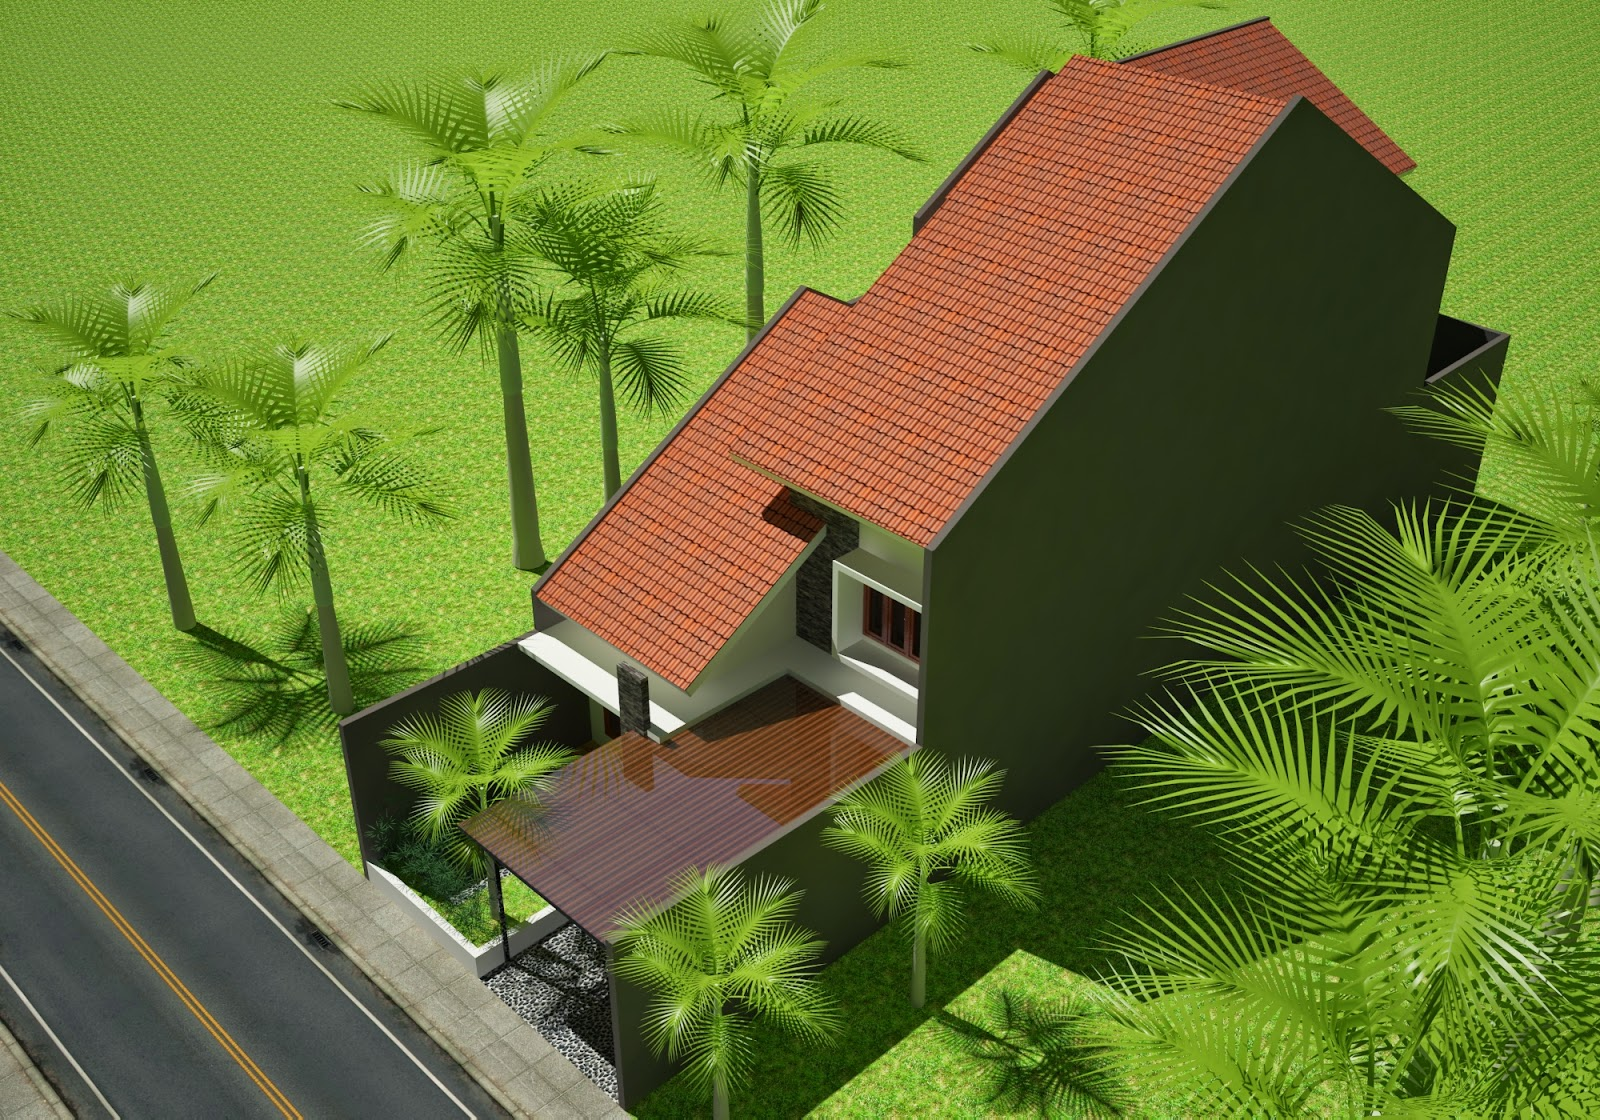 Rumah minimalis Sejuk 2 Lantai, Kesukaan Sang Ibu